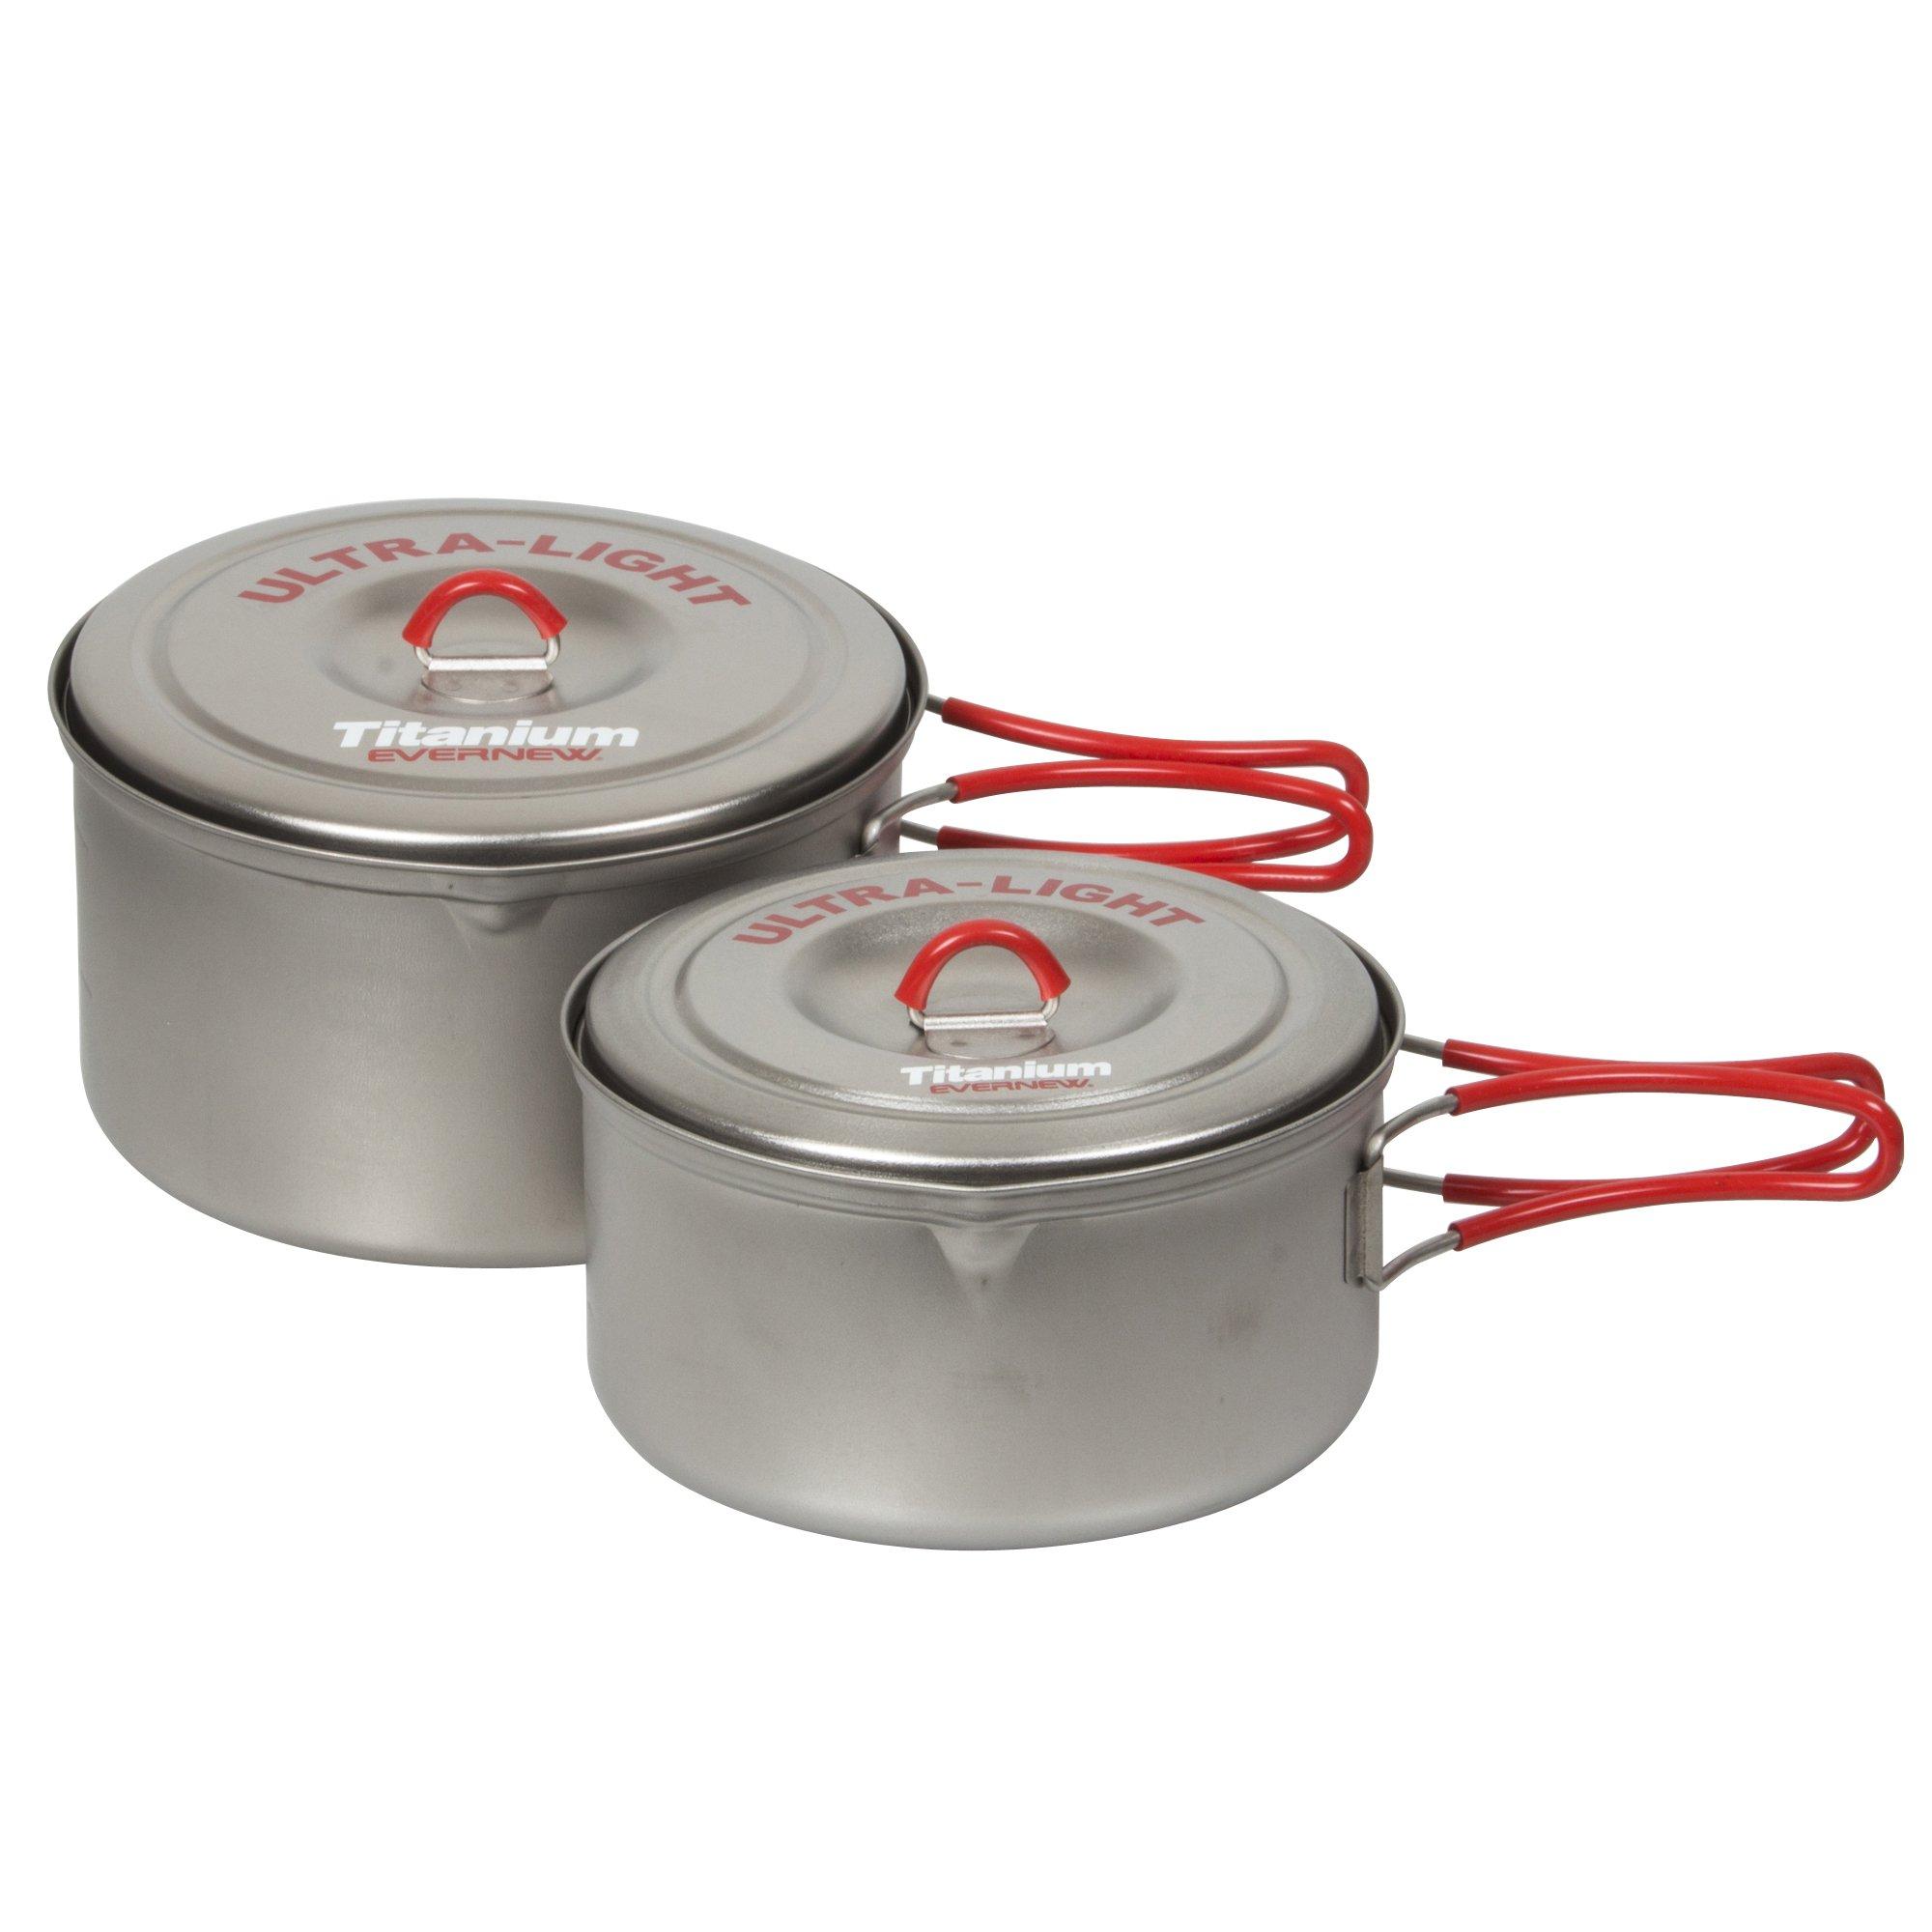 EVERNEW Titanium Ultralight Pot Set, Medium, Red by EVERNEW